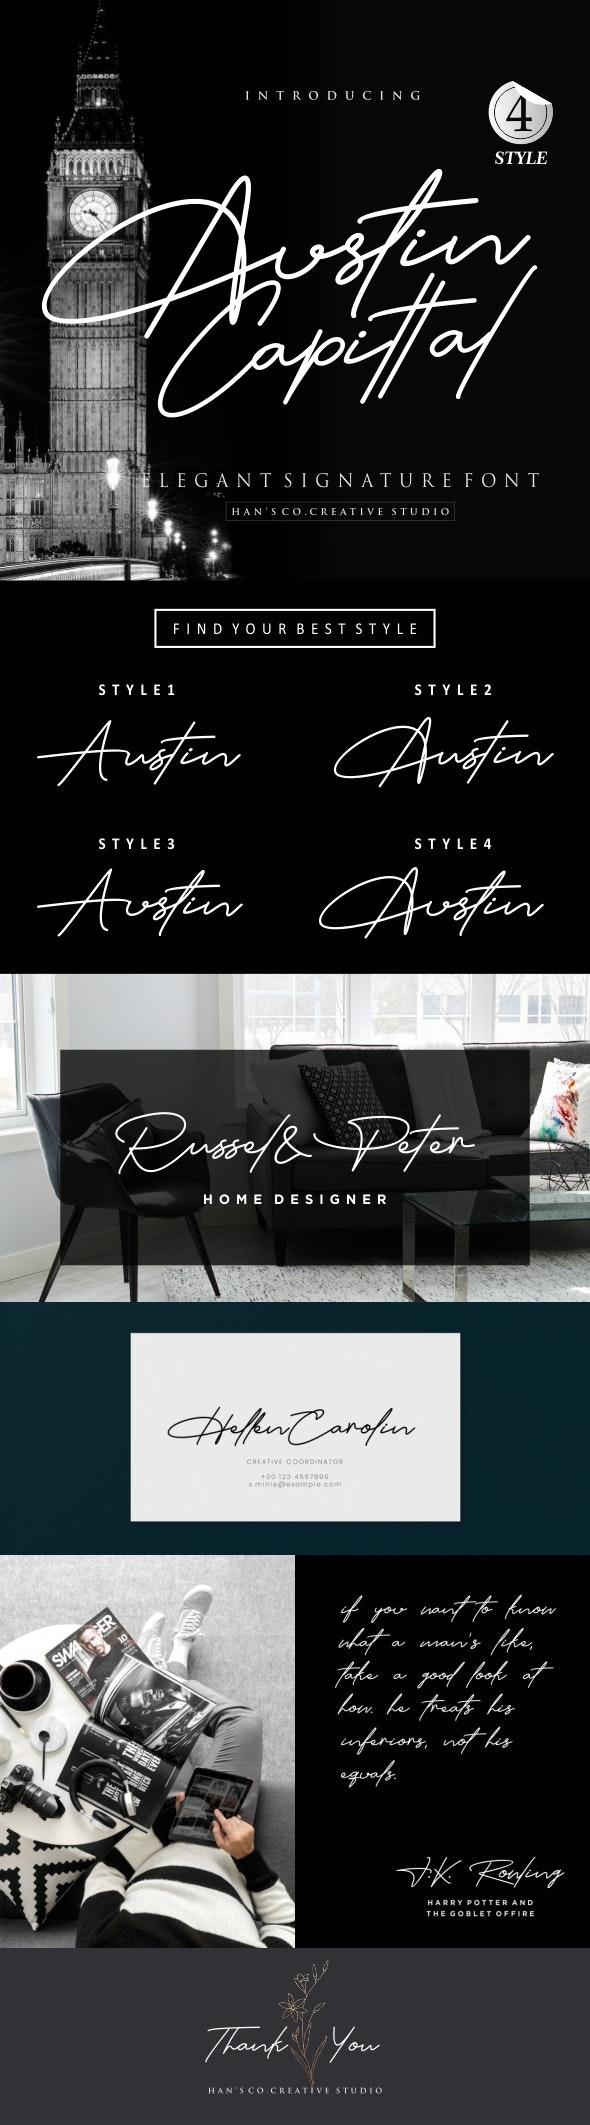 Austin Capittal Font - Handwriting Fonts